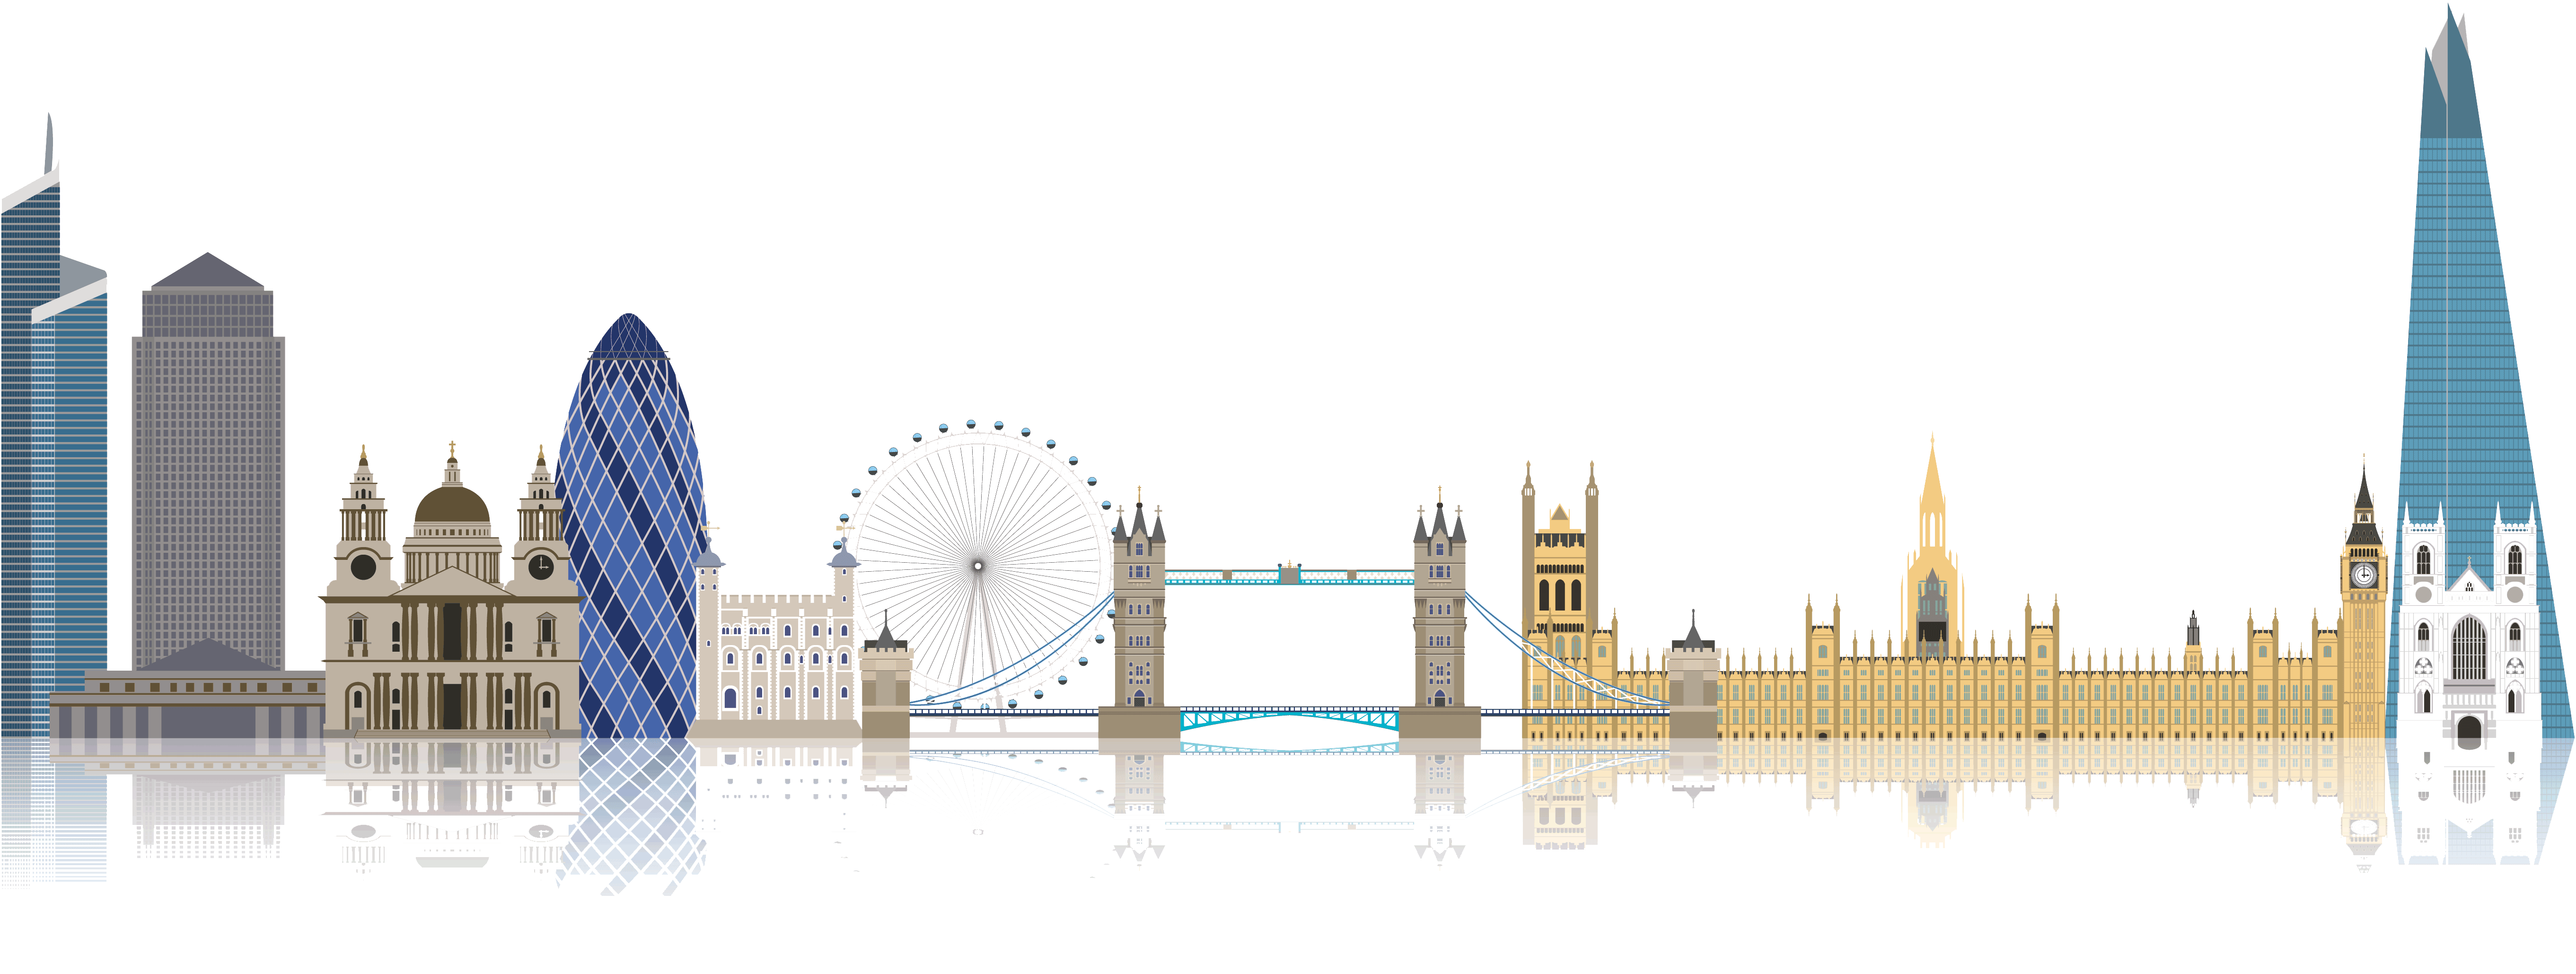 Download London PNG Transparent Image.